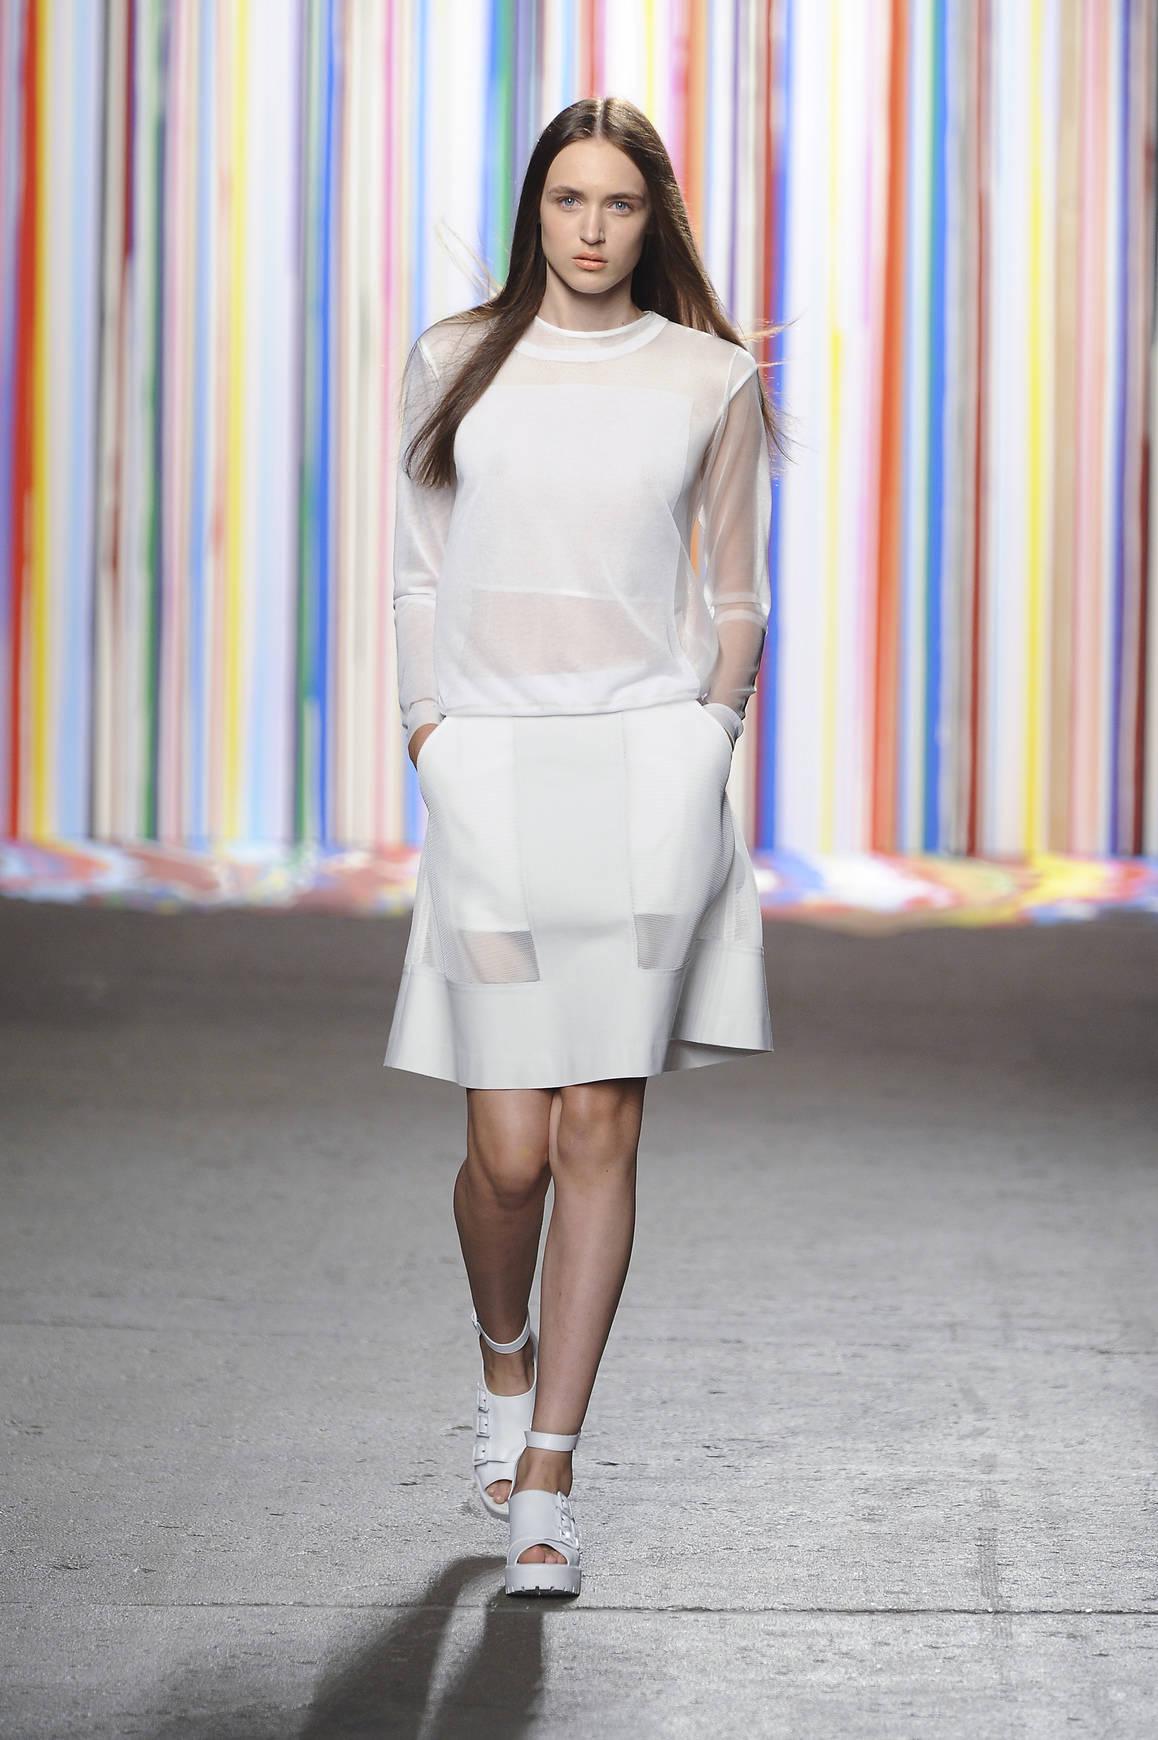 New York Fashion Week Spring 2015 Trends